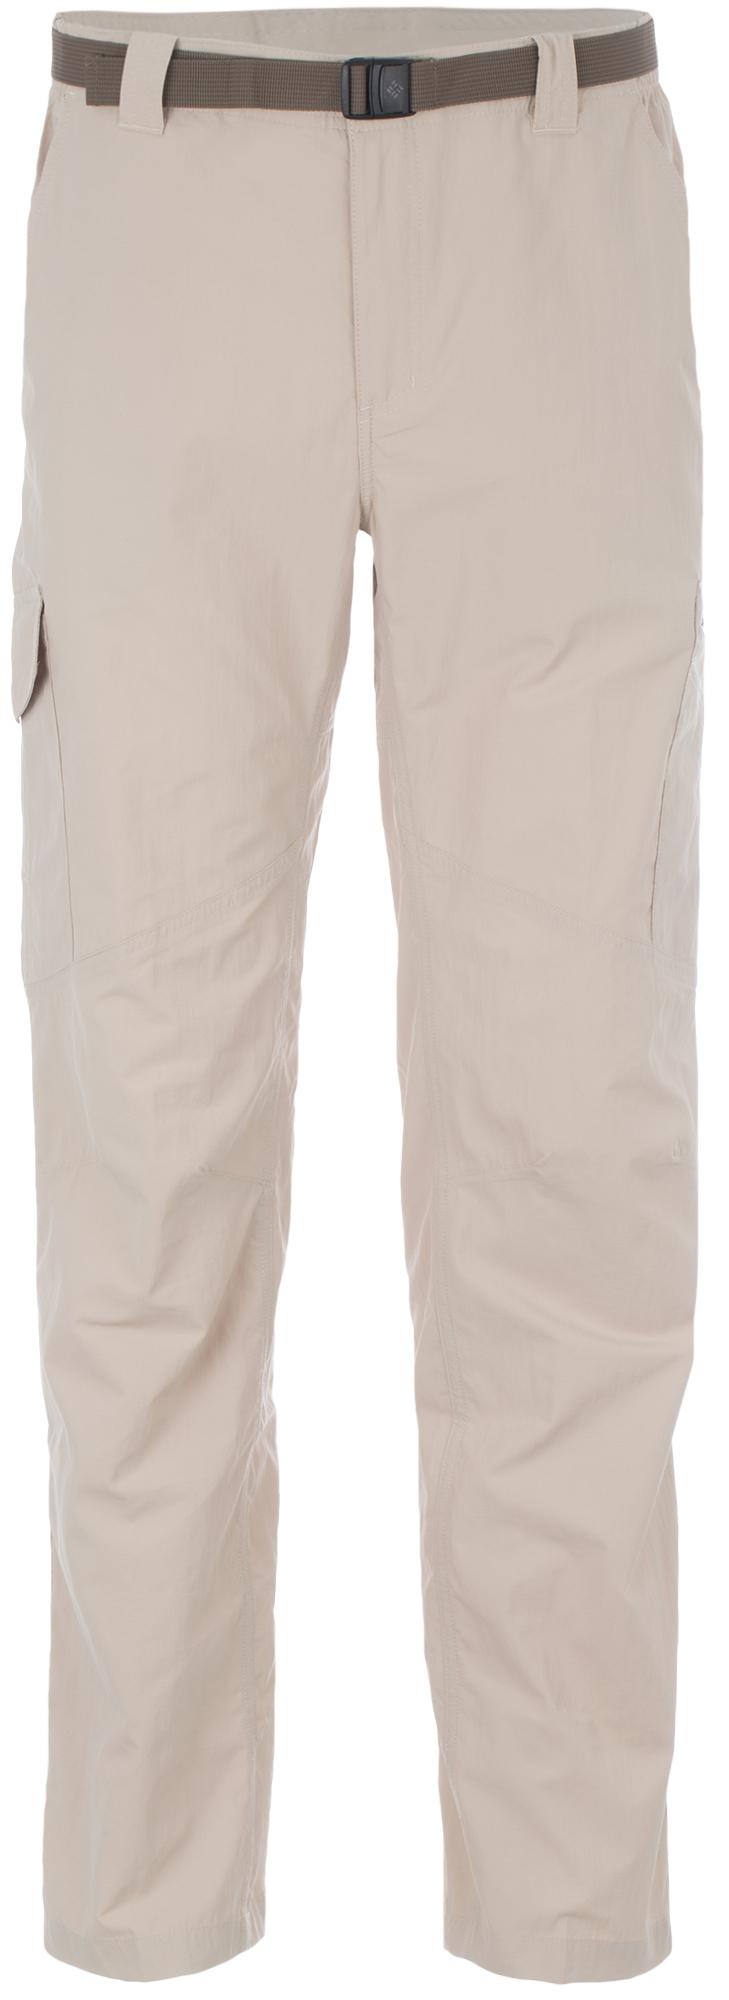 Columbia Брюки мужские Columbia Silver Ridge, размер 56-34 брюки спортивные мужские columbia bridge to bluff цвет серо синий 1578203 028 размер 38 54